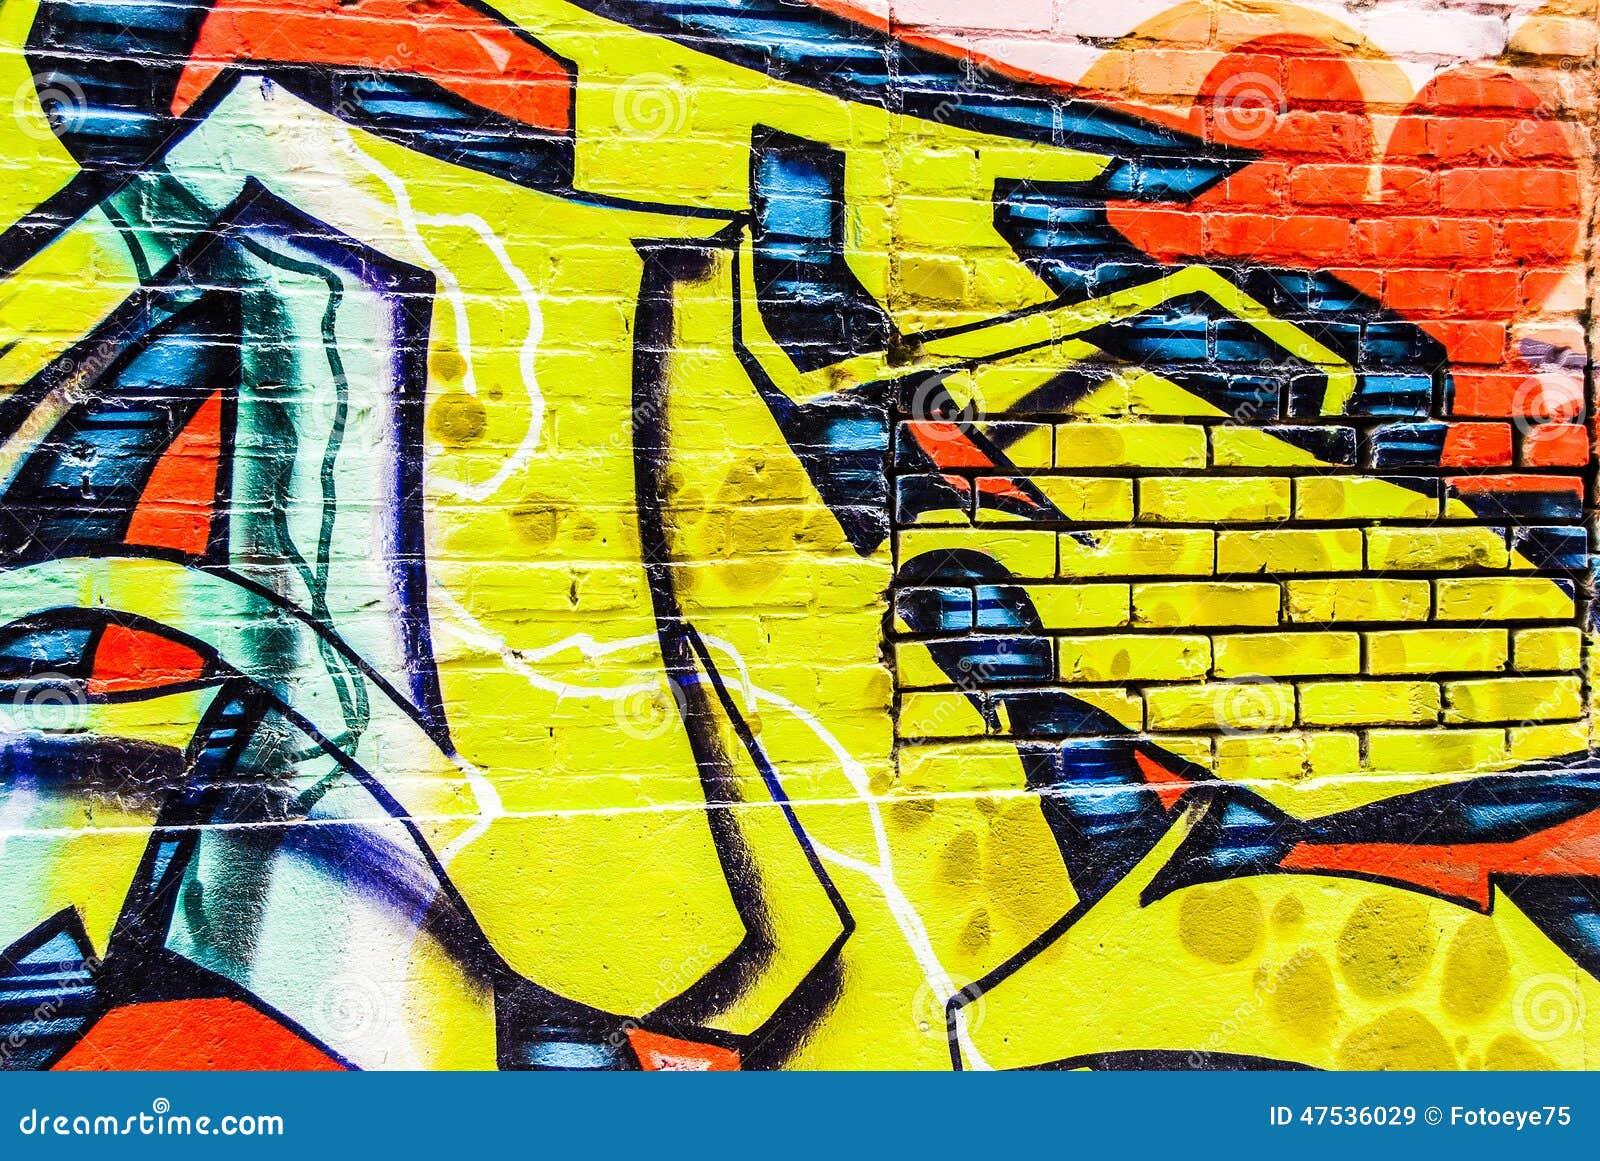 Graffiti Wall editorial stock image. Image of vandalism - 47536029